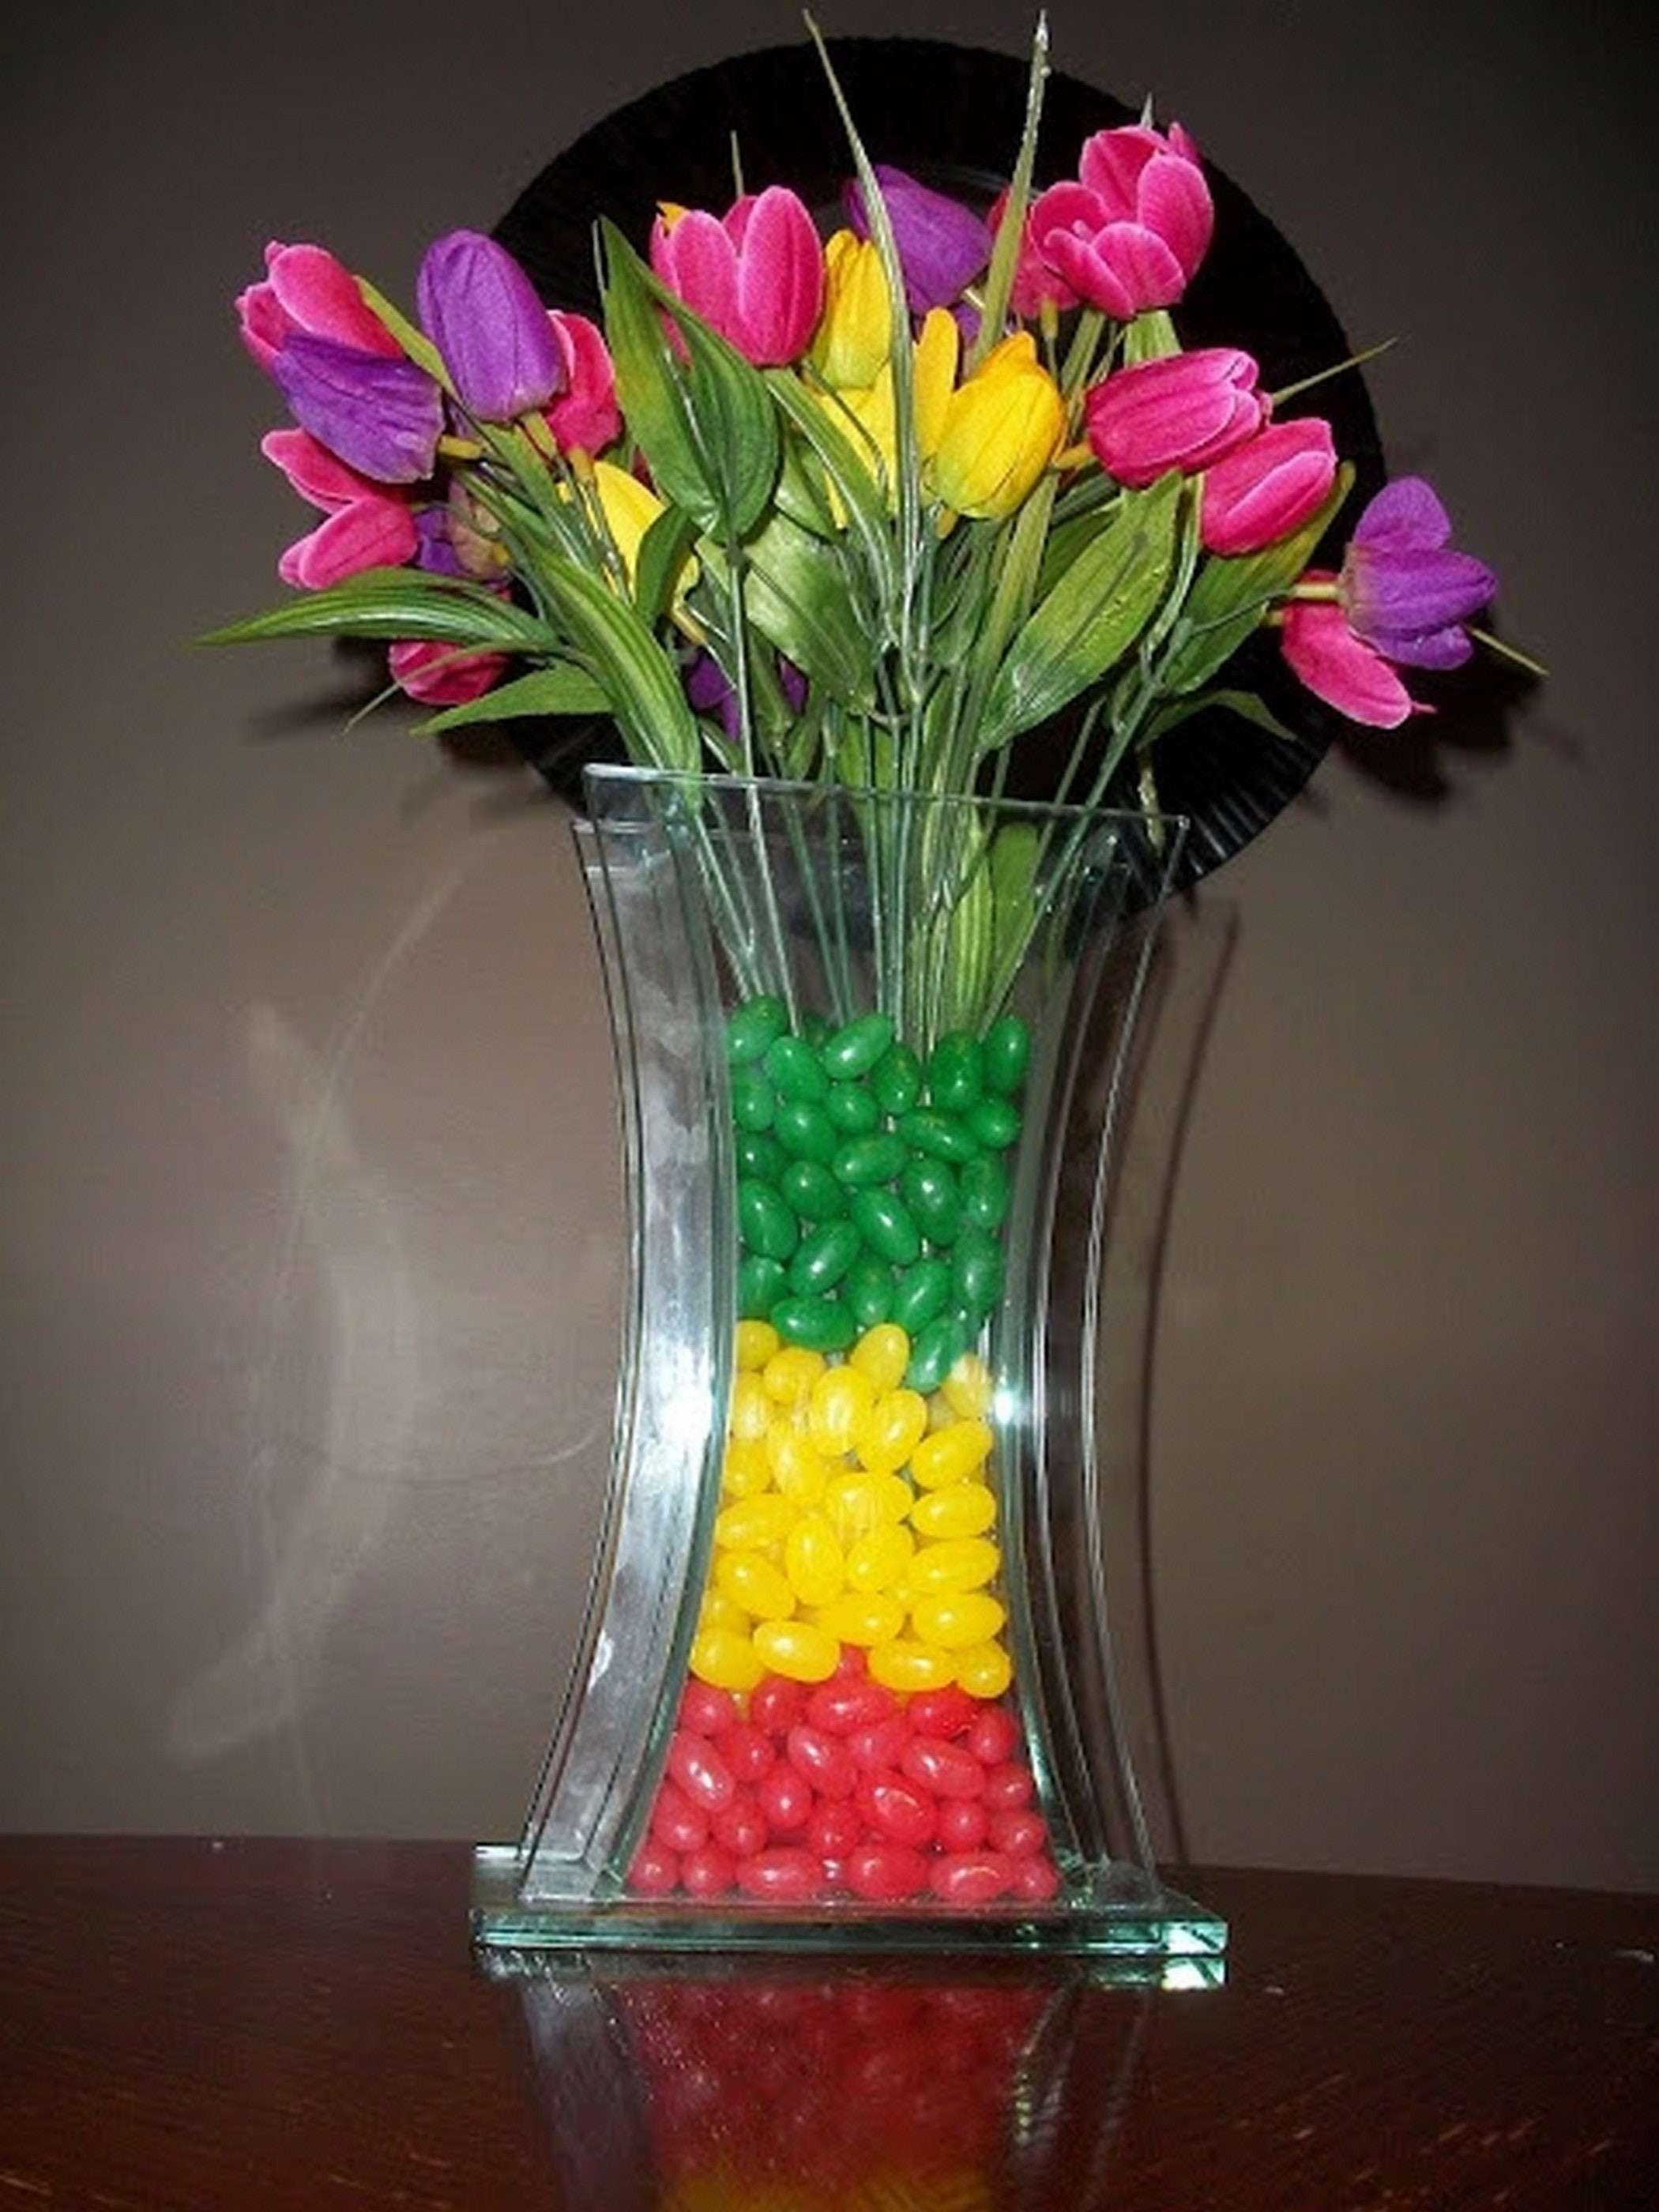 cheap vase centerpiece ideas of 15 cheap and easy diy vase filler ideas 3h vases flower i 0d scheme throughout 15 cheap and easy diy vase filler ideas 3h vases flower i 0d scheme